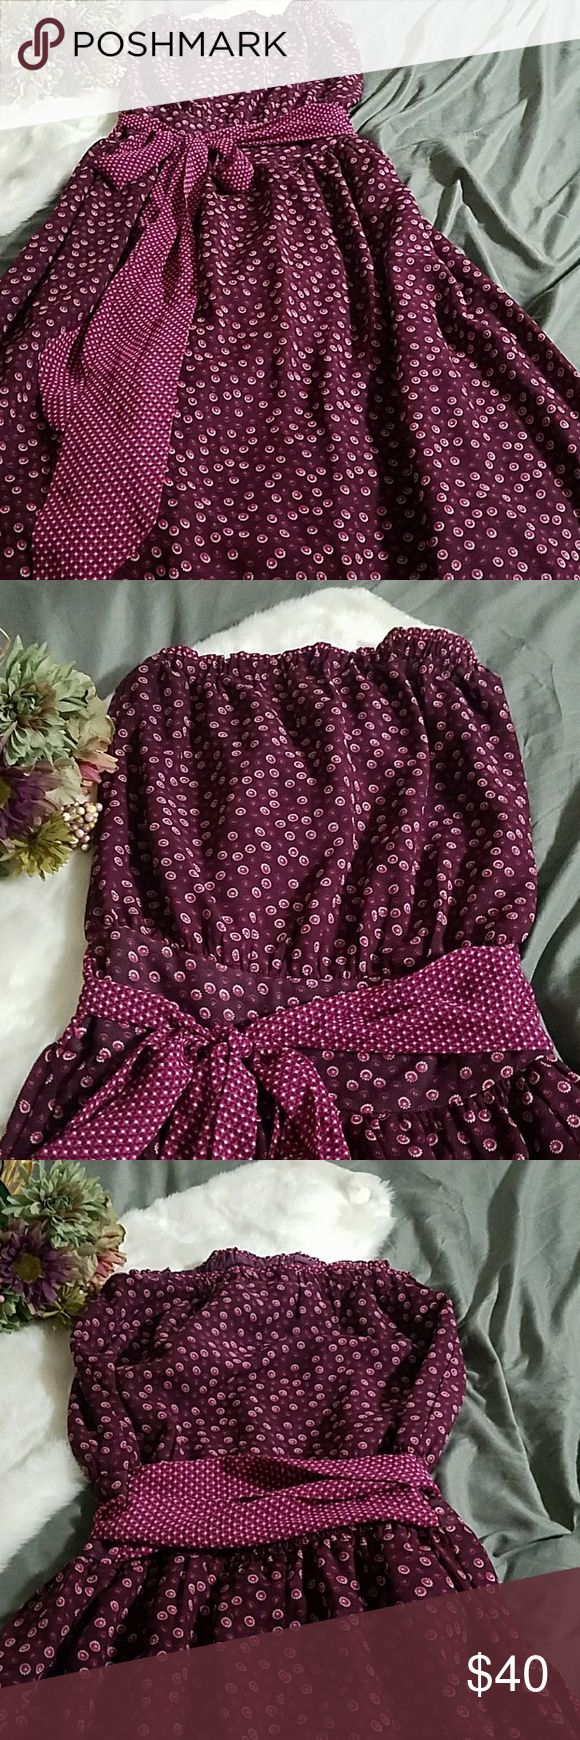 Strapless maxi dress Like new, floral print Costa Blanca Dresses Maxi